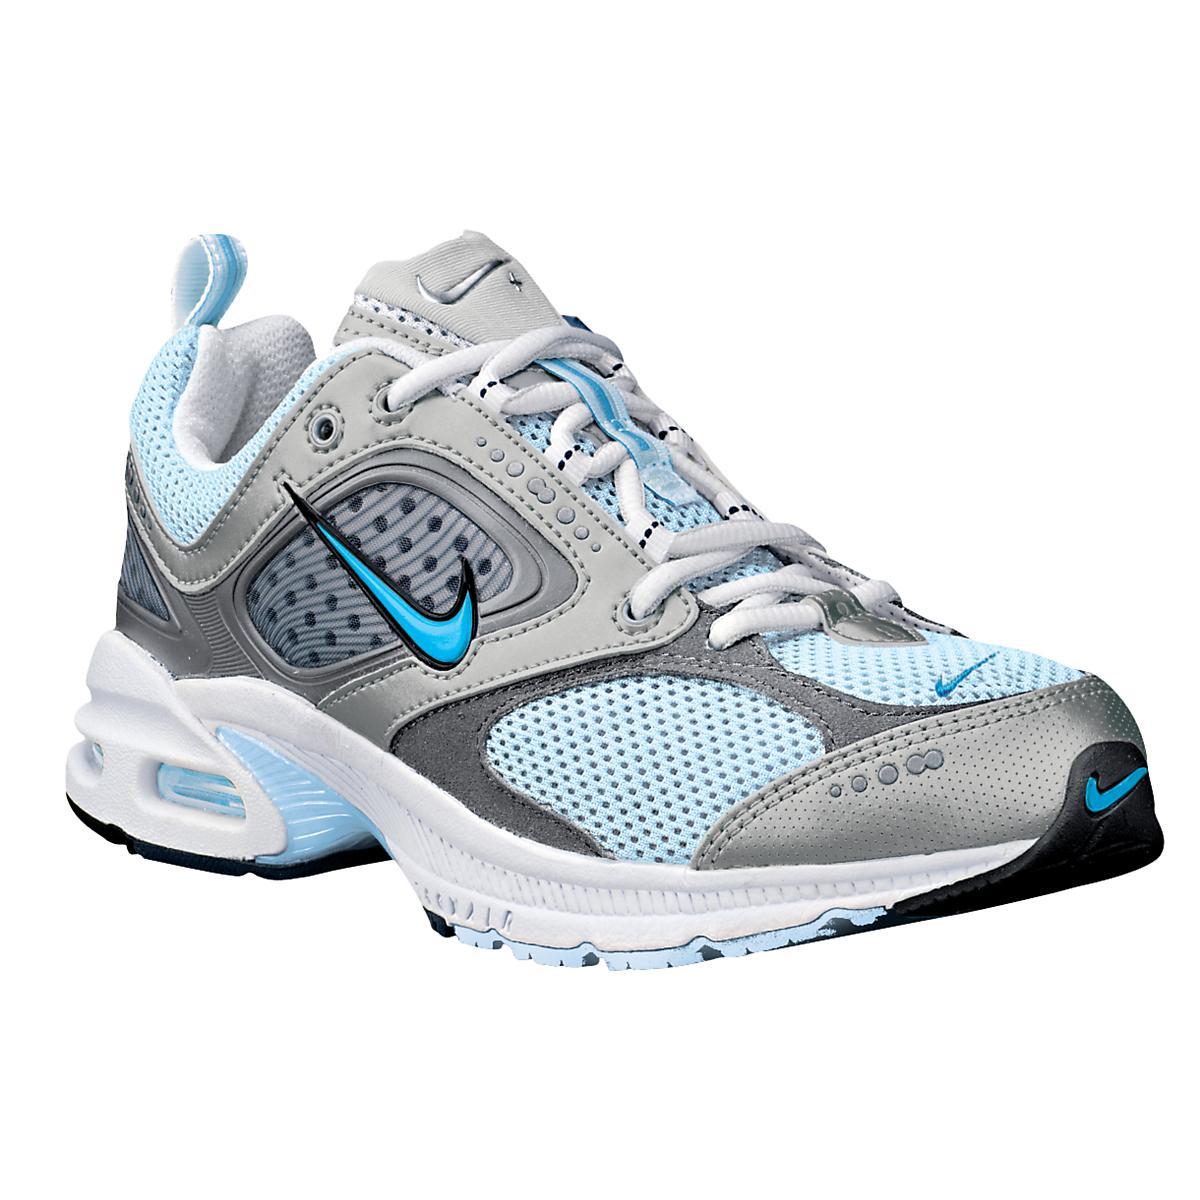 online retailer 9ce49 d814e Womens Nike Air Max Moto+ 4 Running Shoe at Road Runner Sports